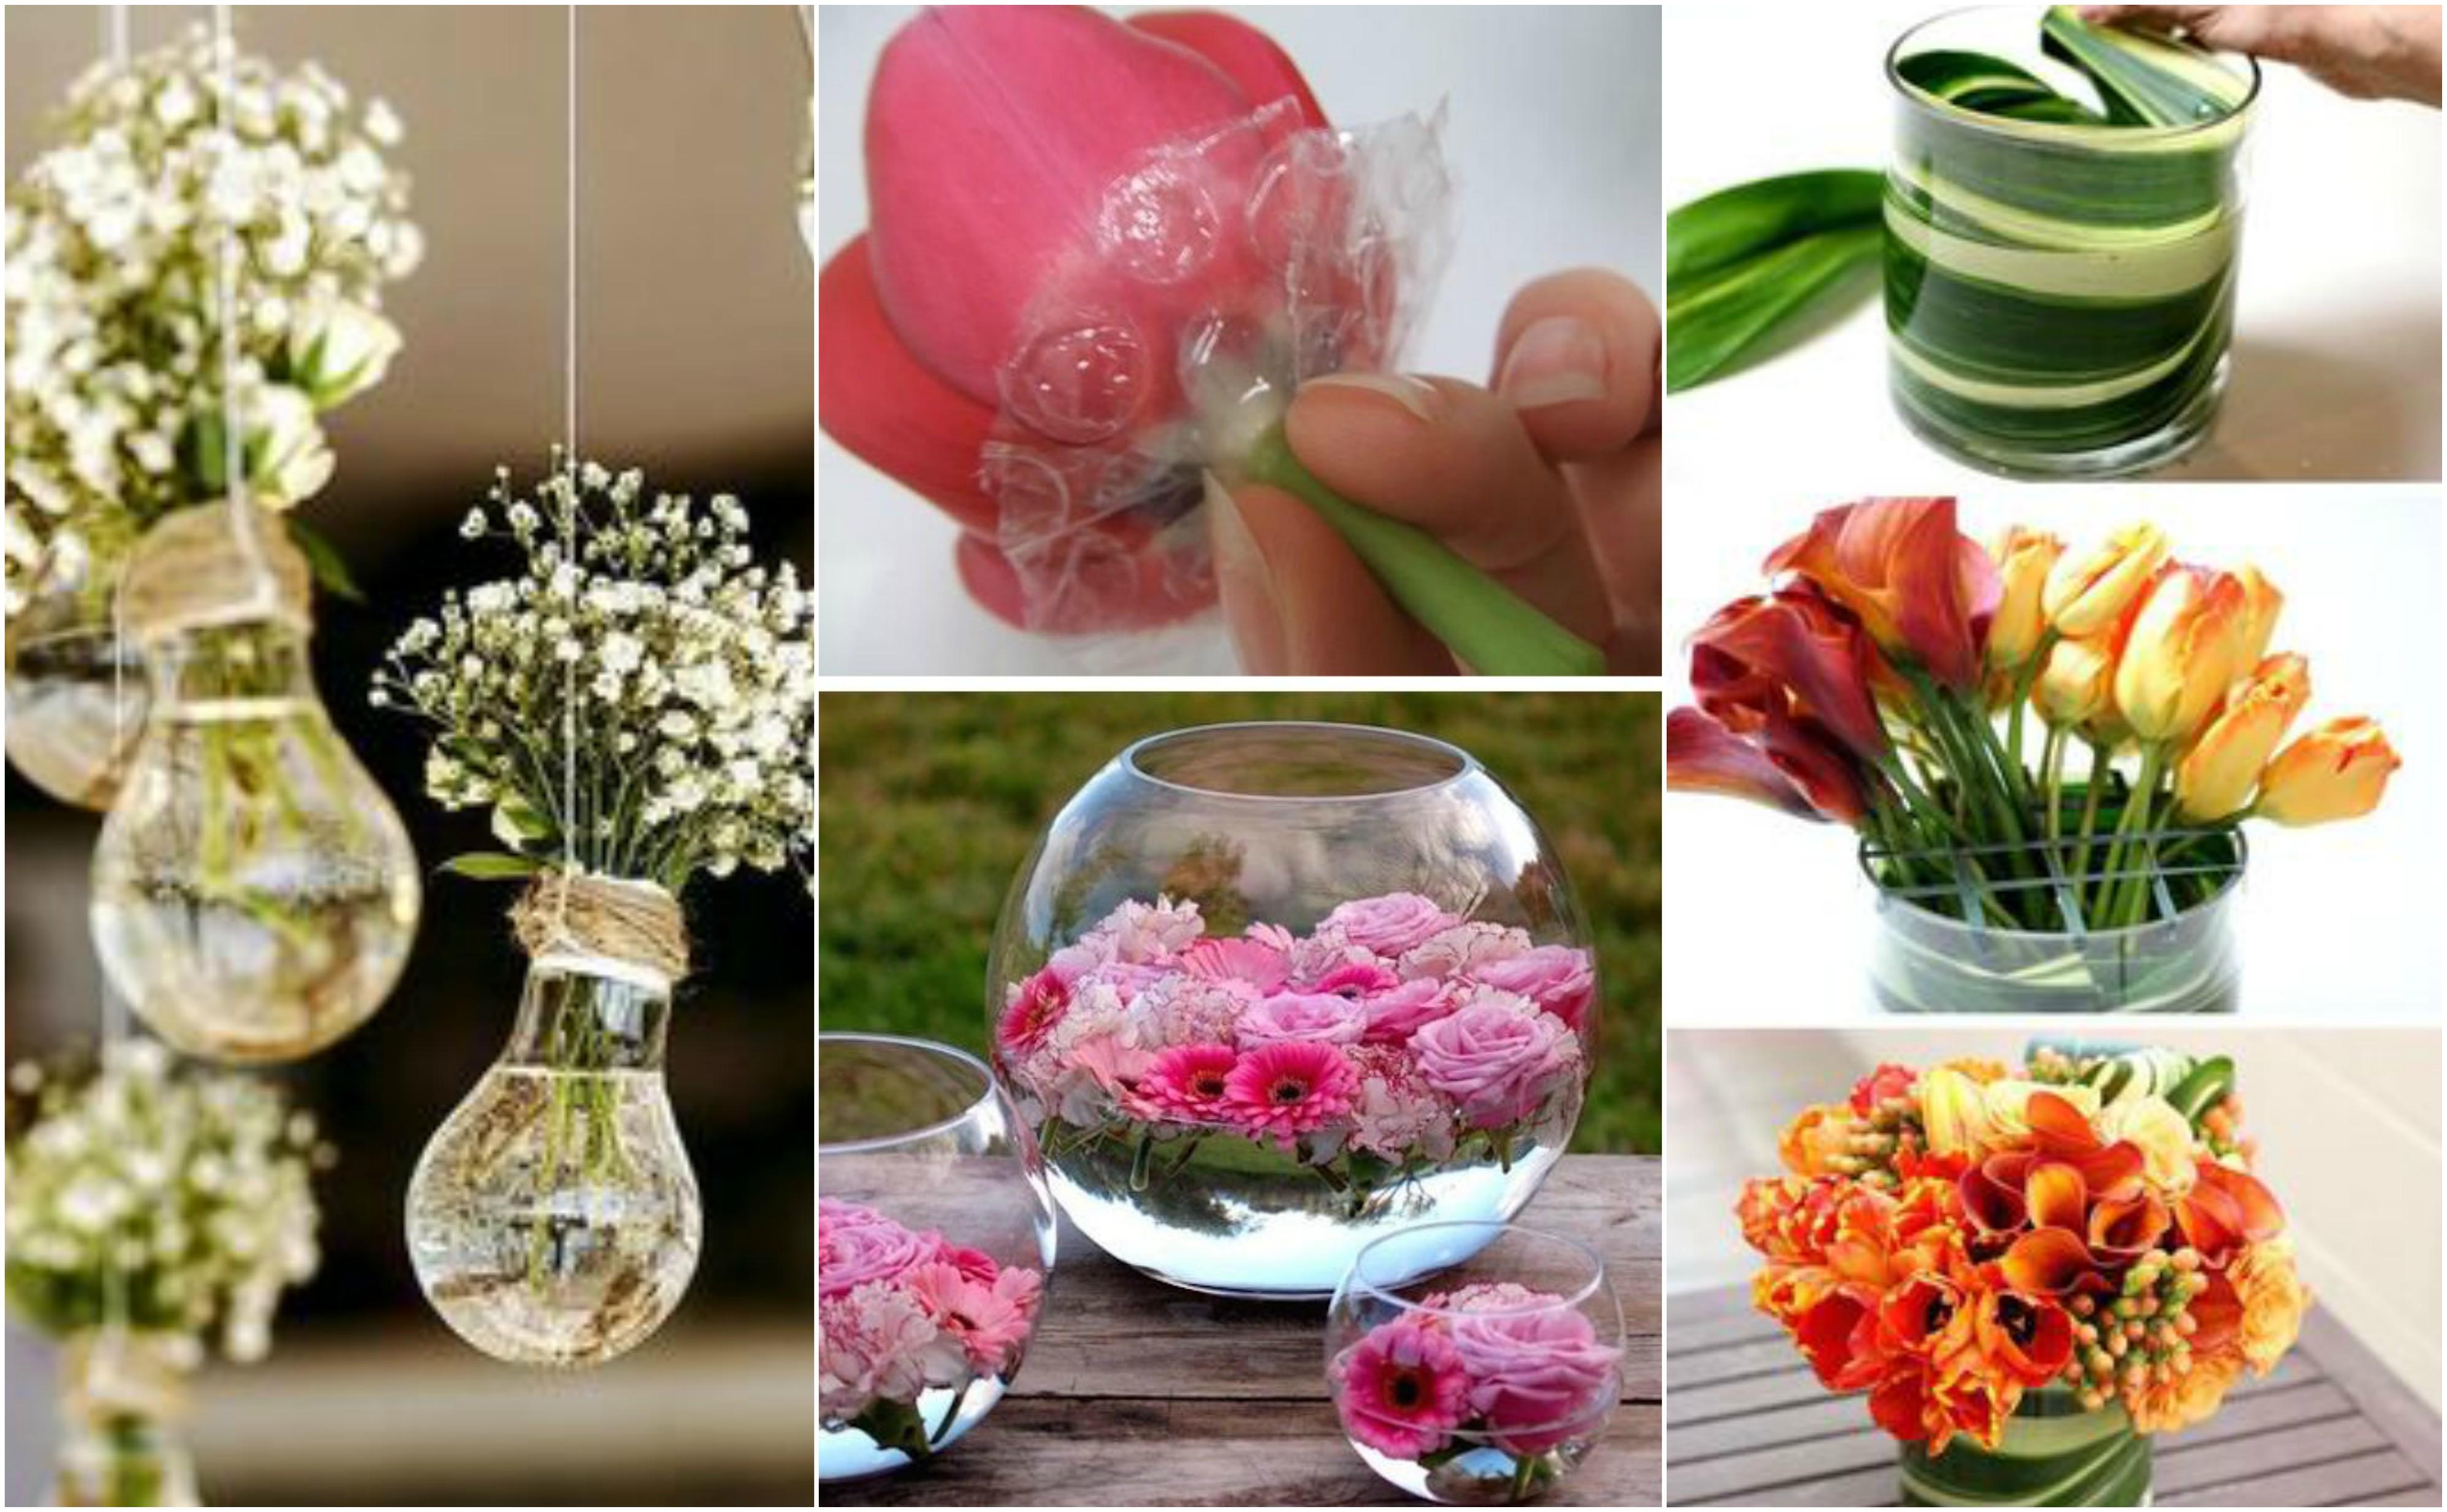 deko diy tipps blumen in der vase arrangieren. Black Bedroom Furniture Sets. Home Design Ideas